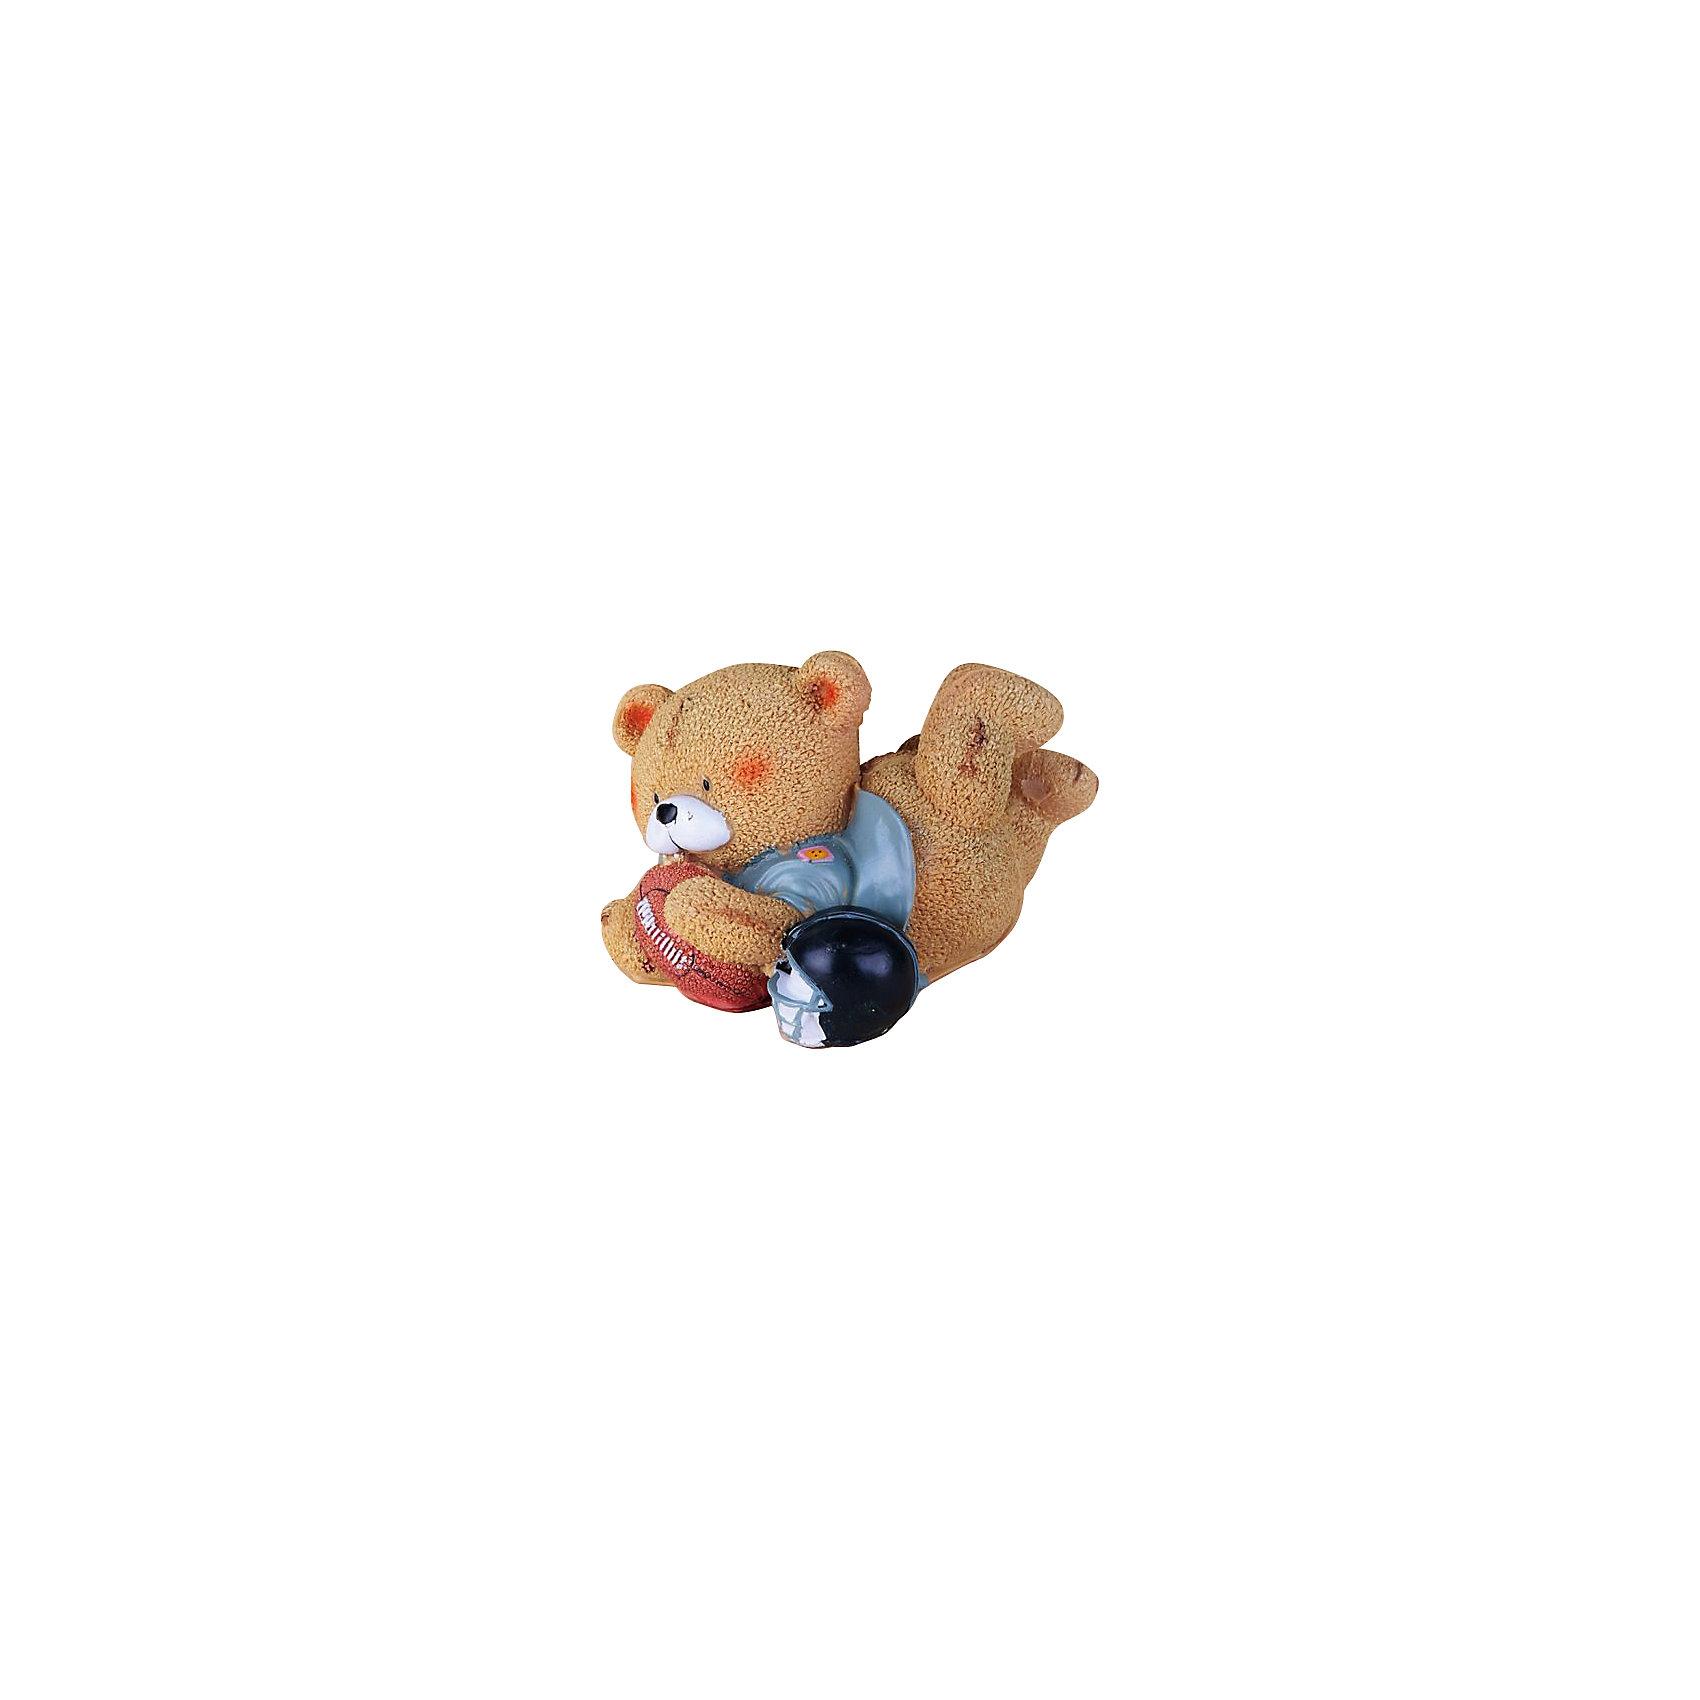 Феникс-Презент Декоративная фигурка Мишка-регбист ночники pabobo ночник мишка путешественник